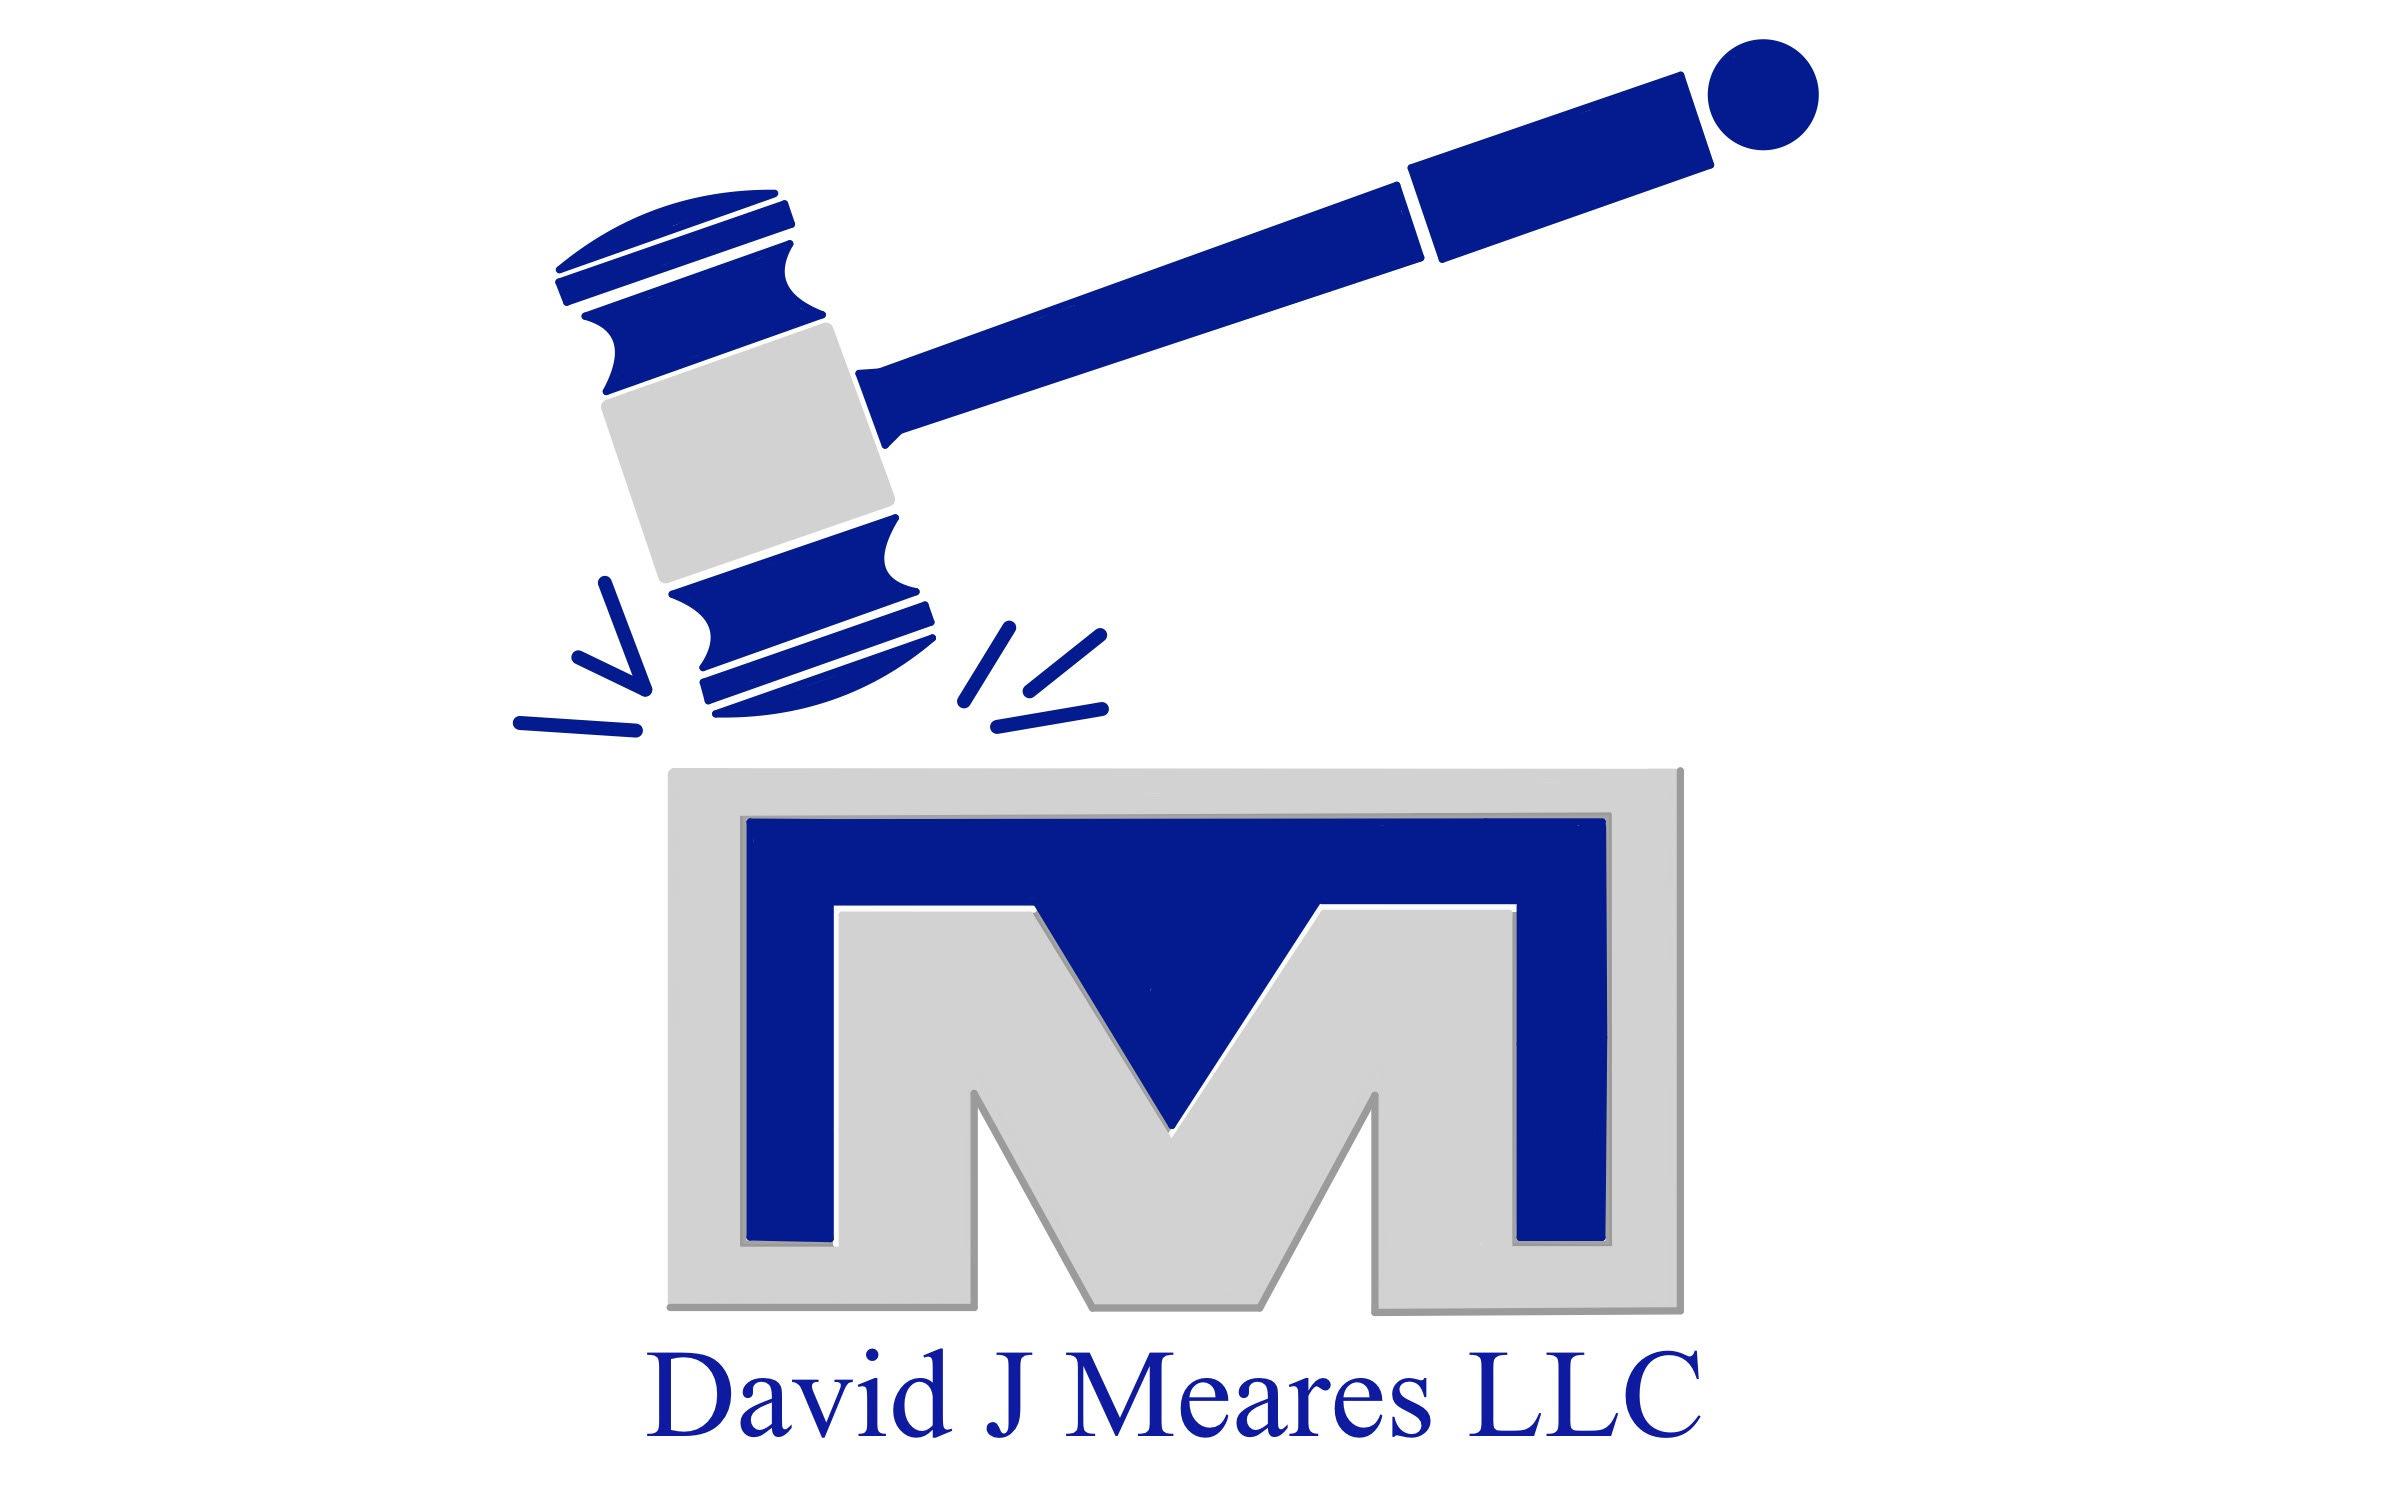 David J Meares LLC.